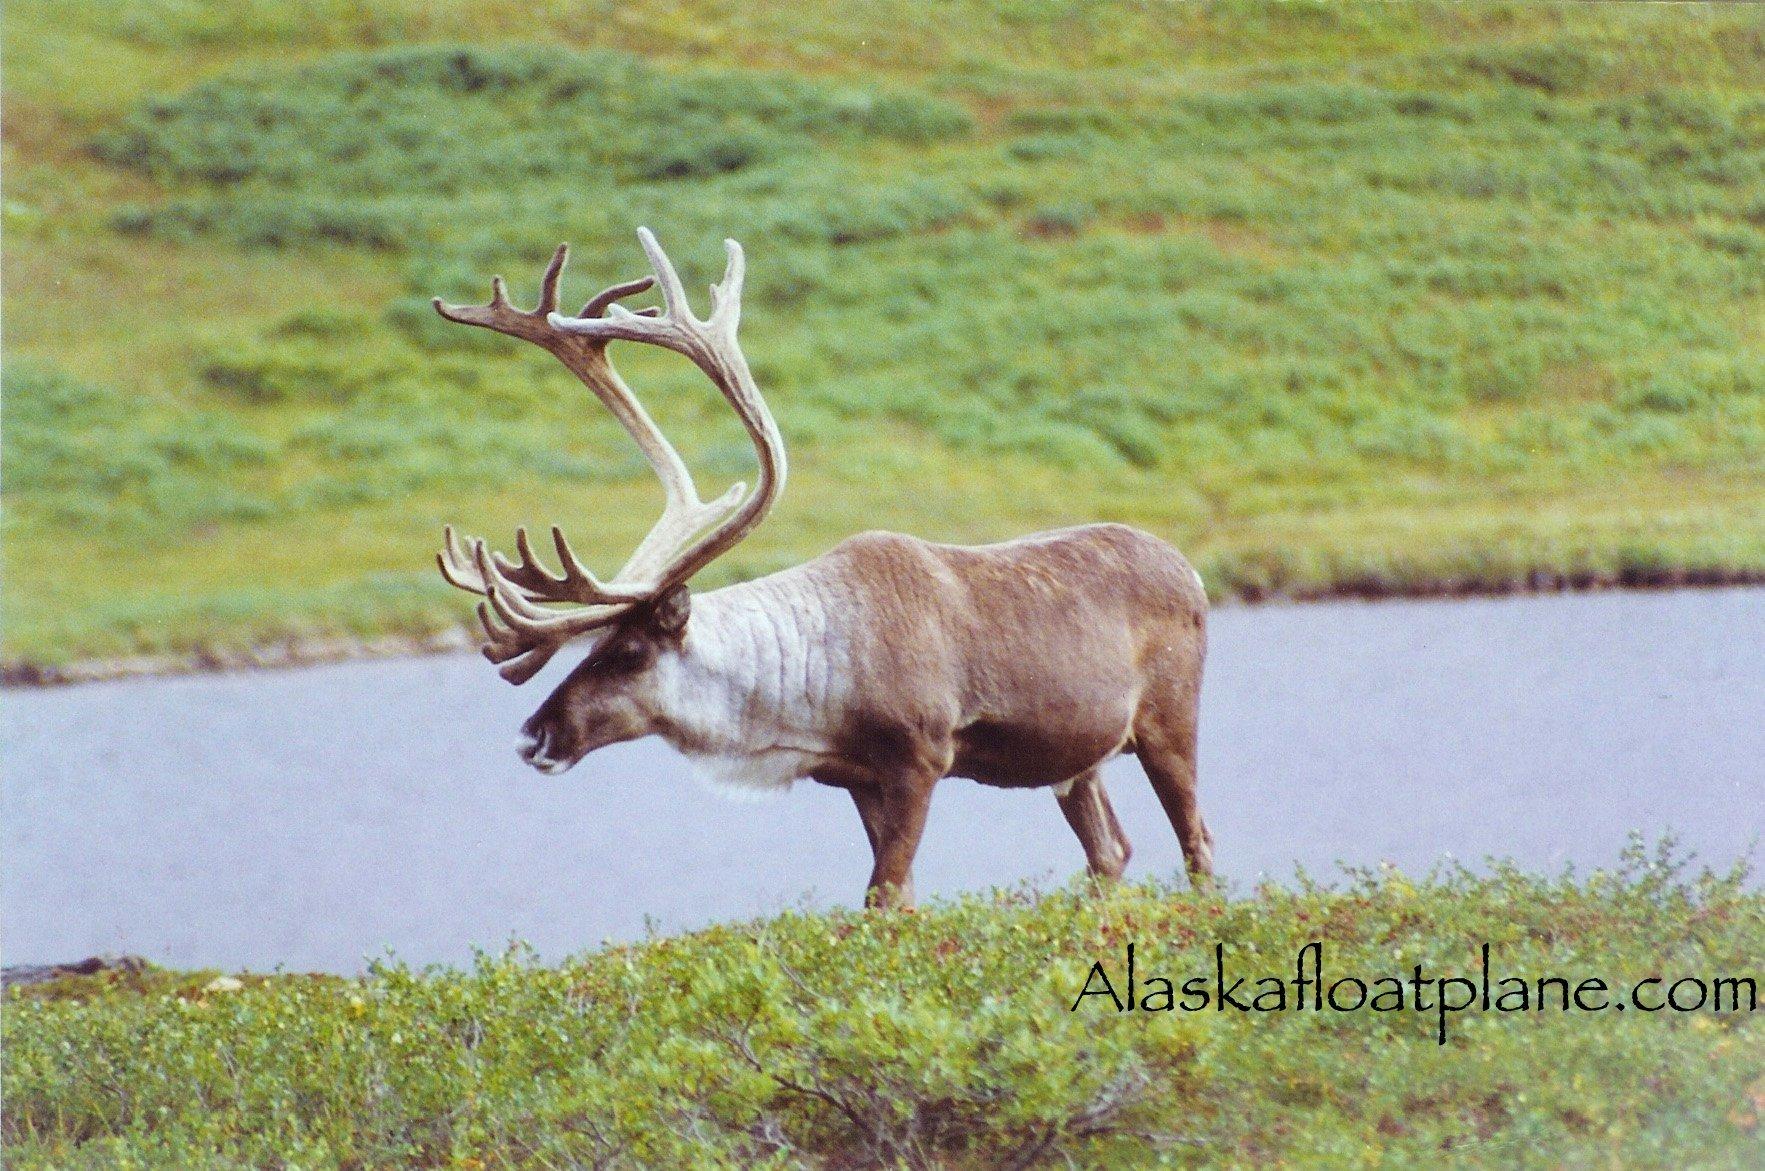 Flightseeing tour Talkeetna Alaska, Wildlife flights, wildlife flights